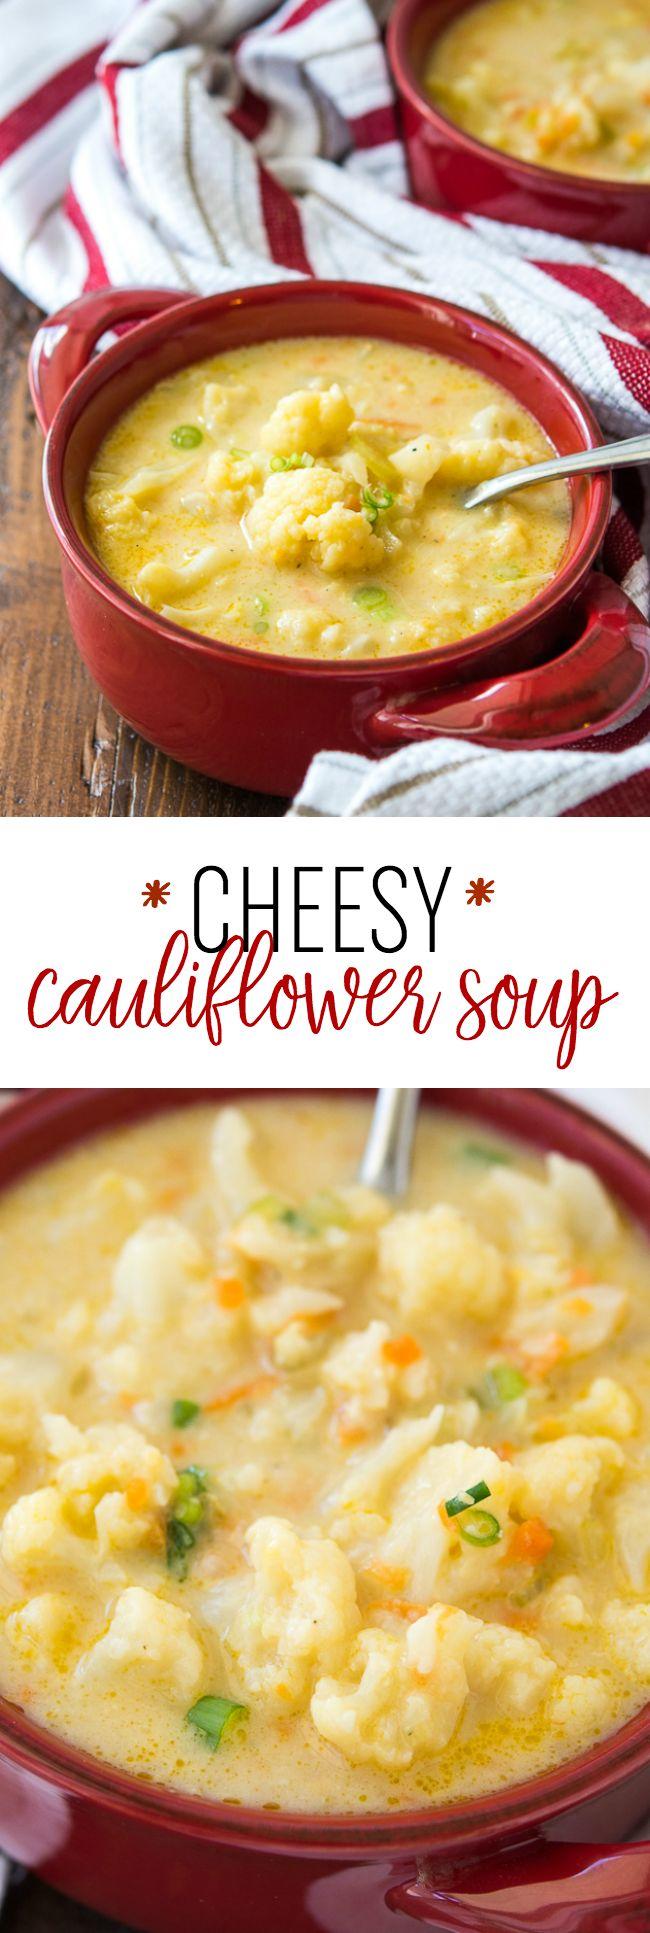 heesy Cauliflower Soup